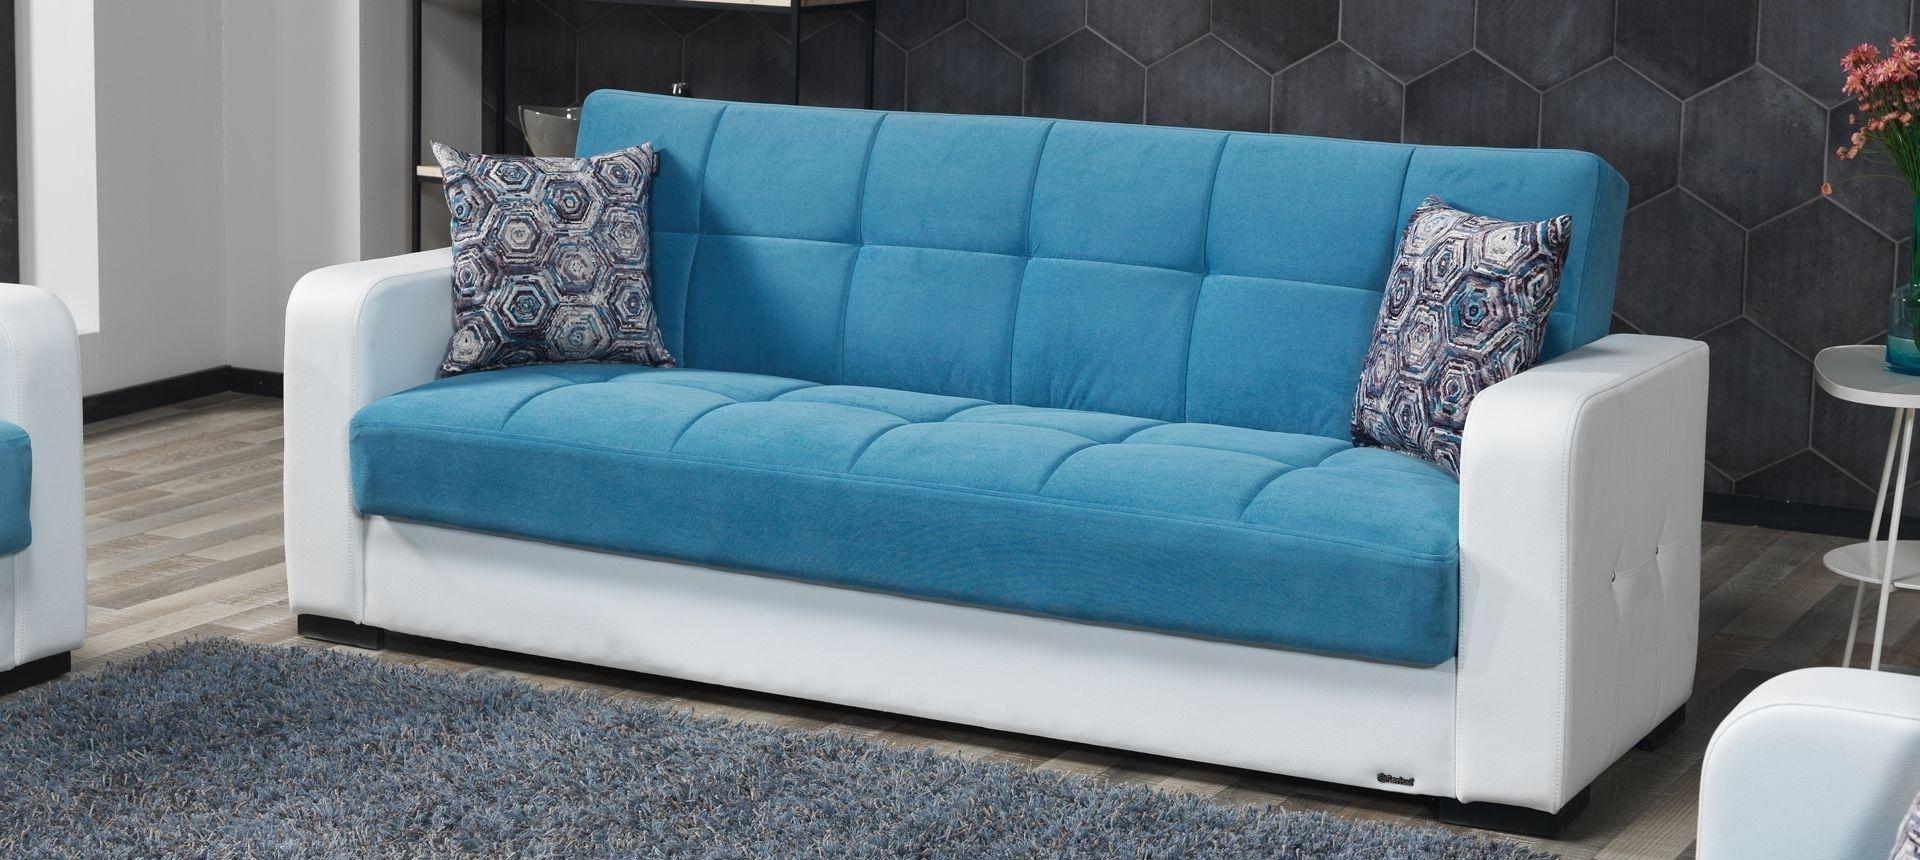 Canapea extensibila cu lada de depozitare, tapitata cu stofa 3 locuri Destina Albastru / Alb K1, l222xA72xH83 cm